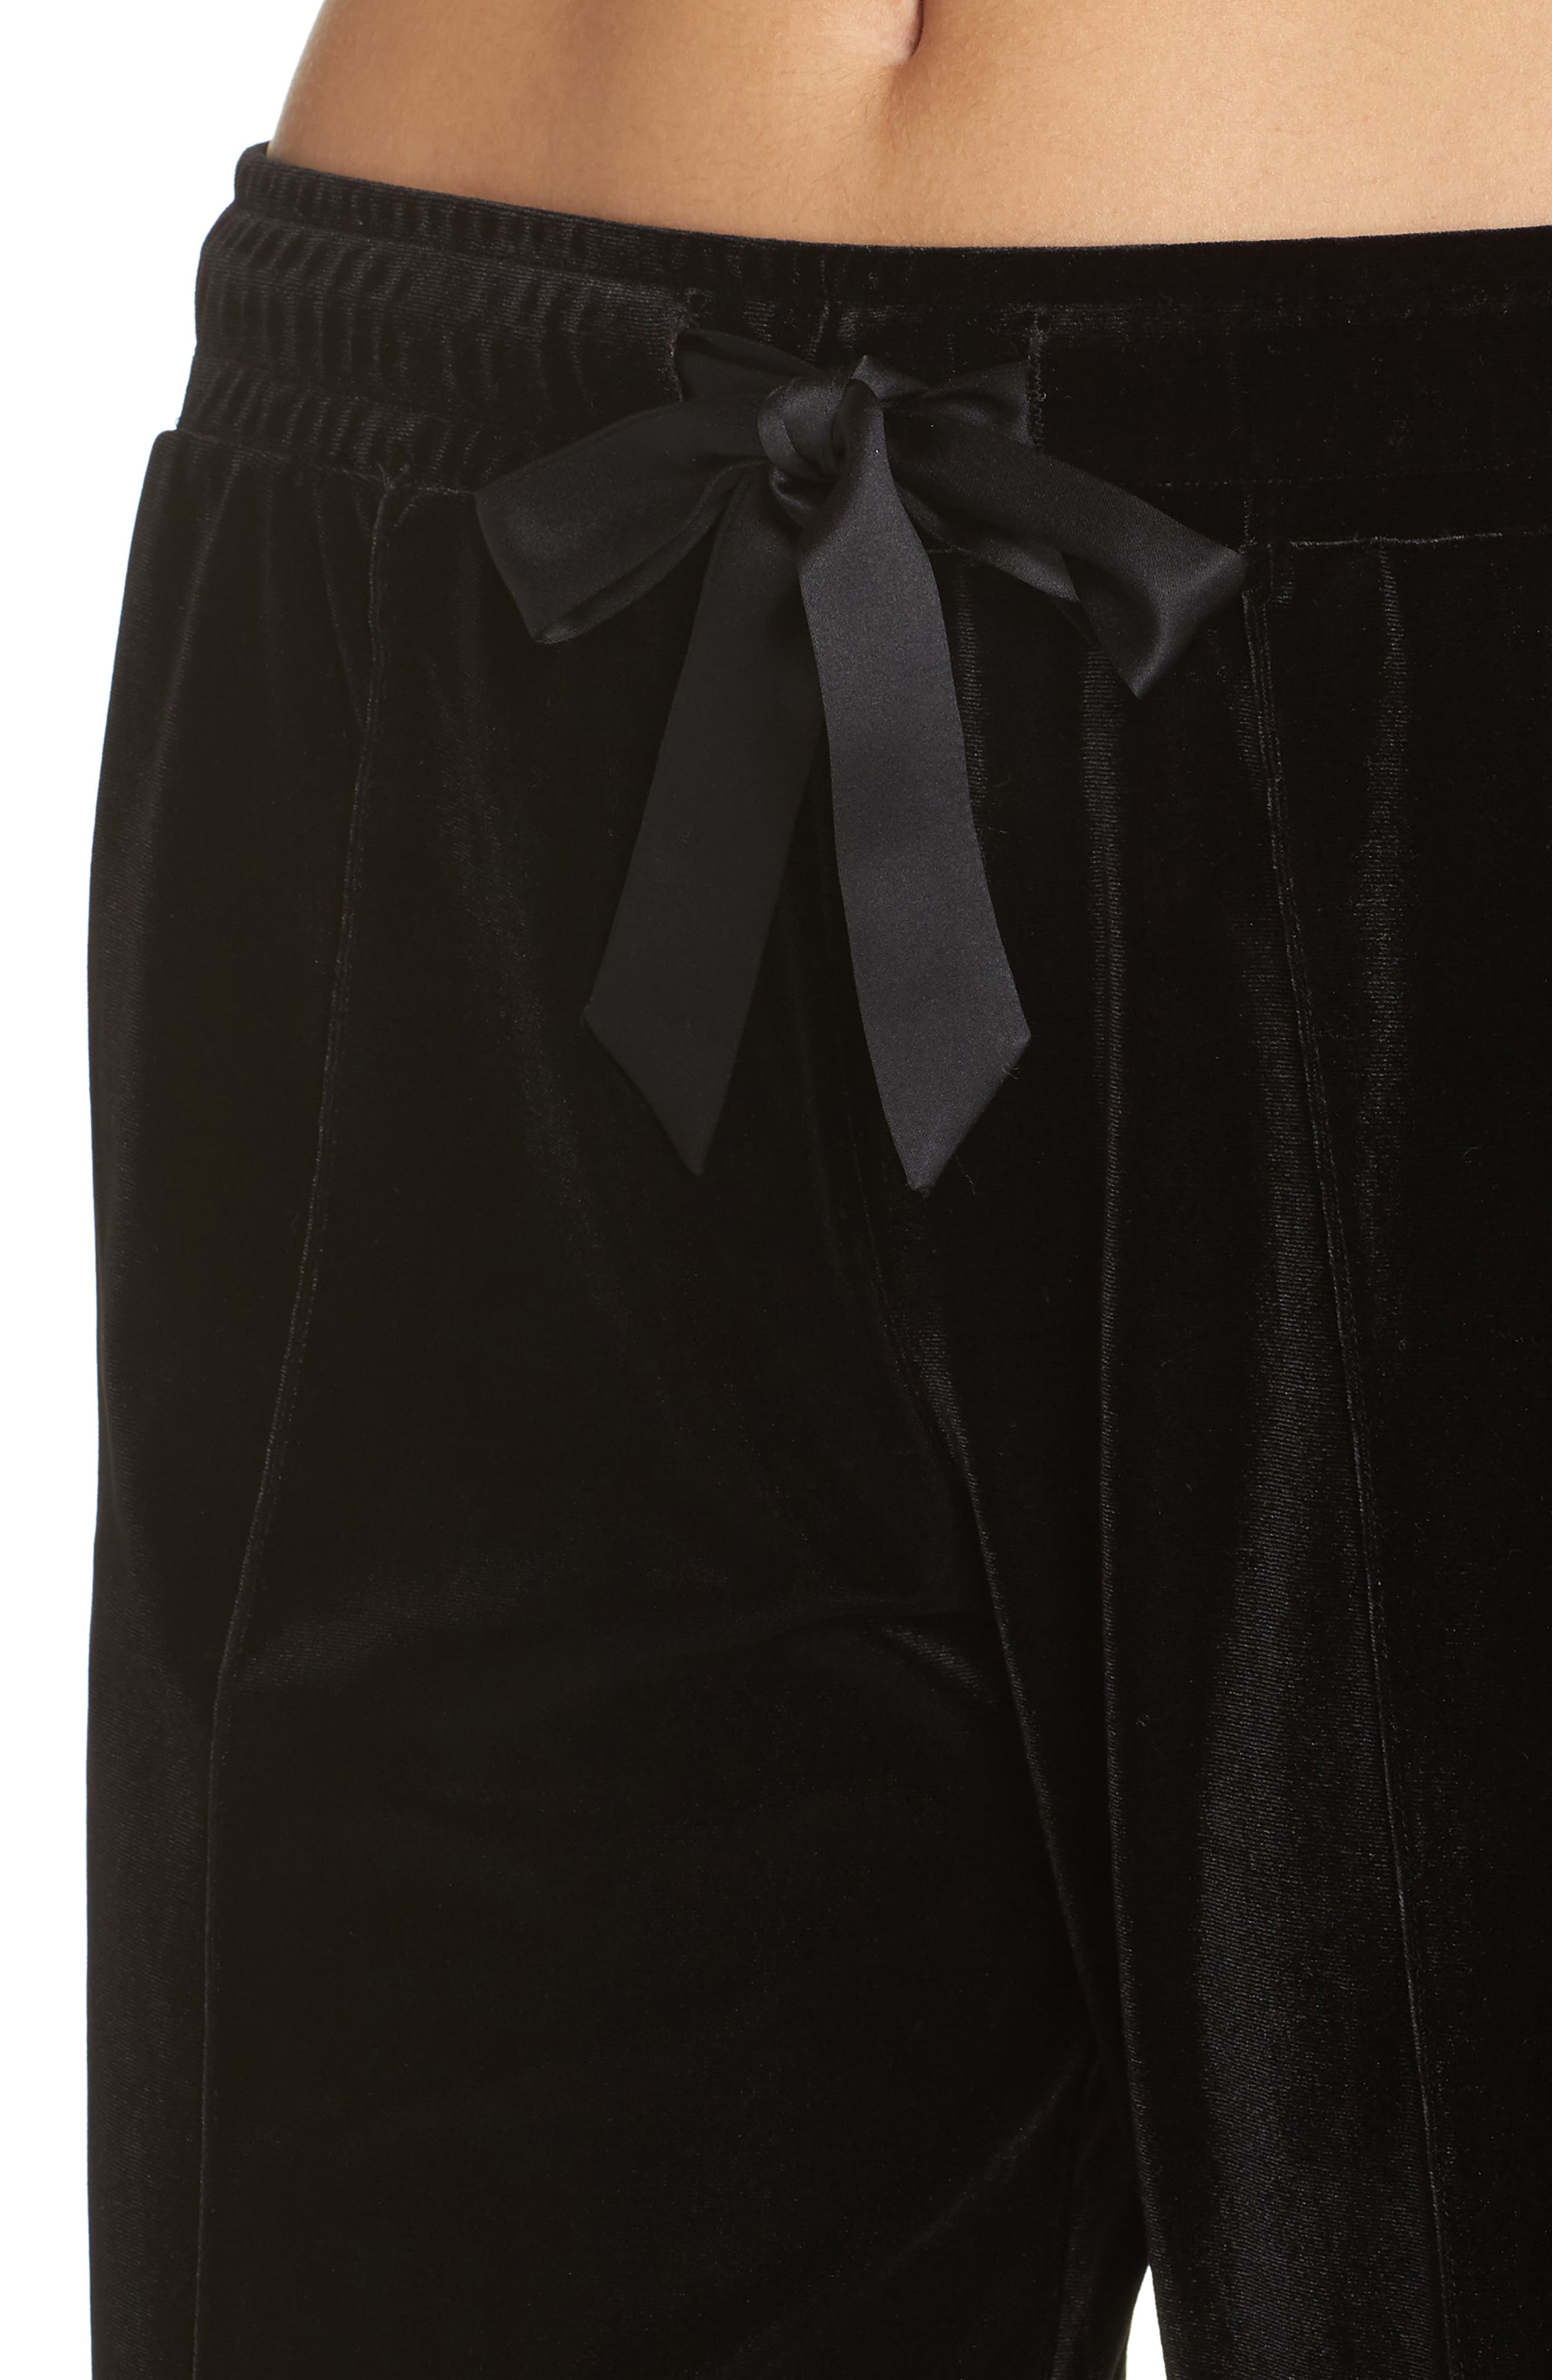 Dream Away Velour Lounge Pants,                             Alternate thumbnail 4, color,                             BLACK